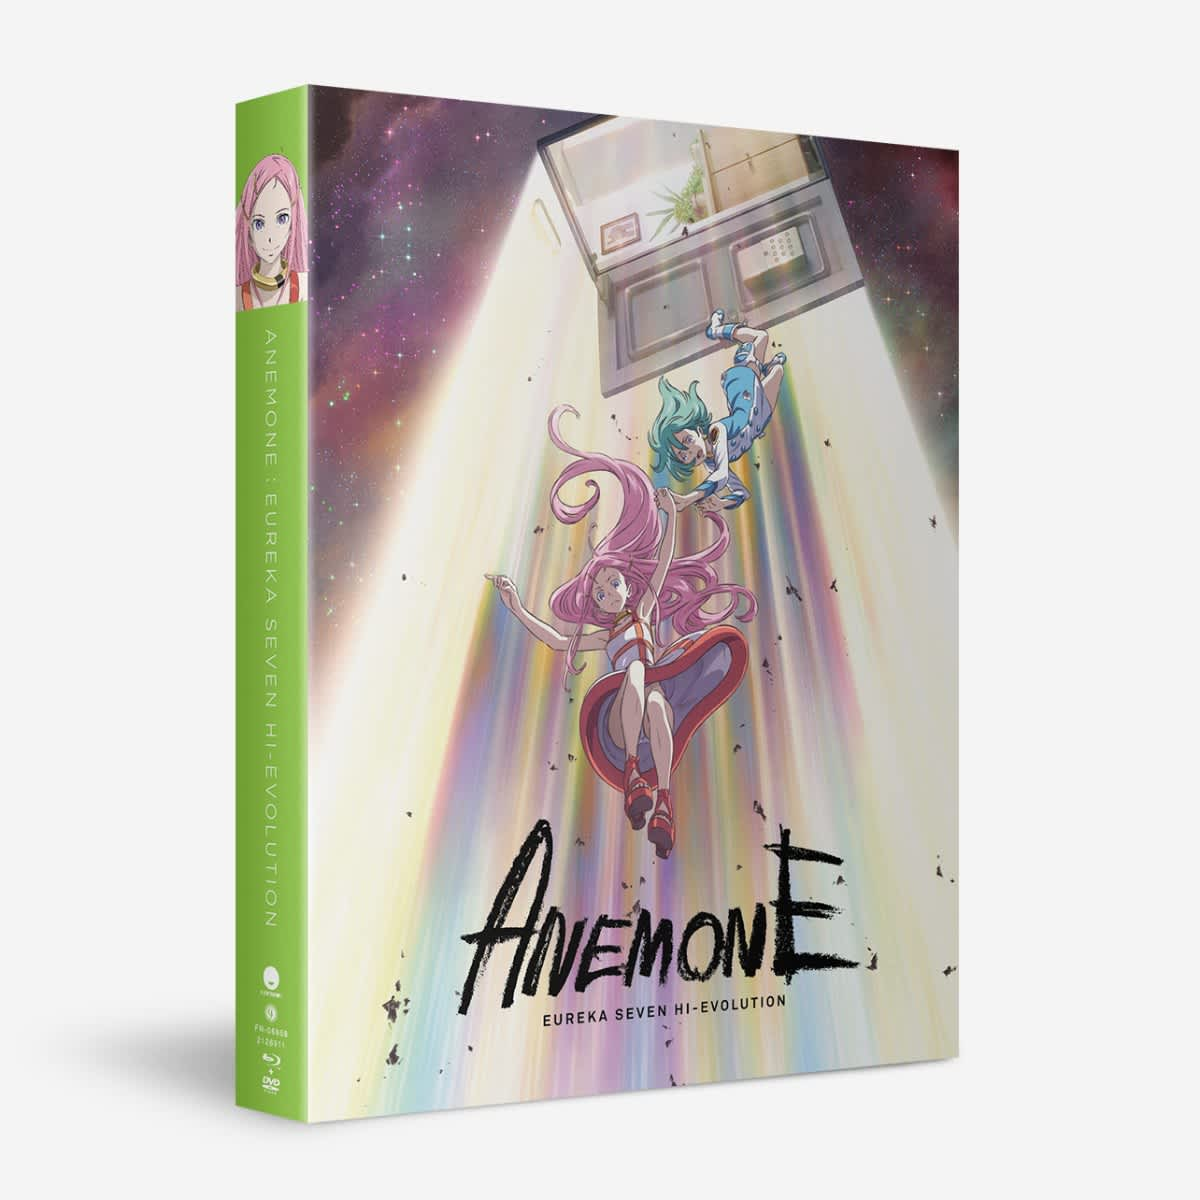 Eureka Seven Hi-Evolution Movie 2: Anemone Blu-ray/DVD